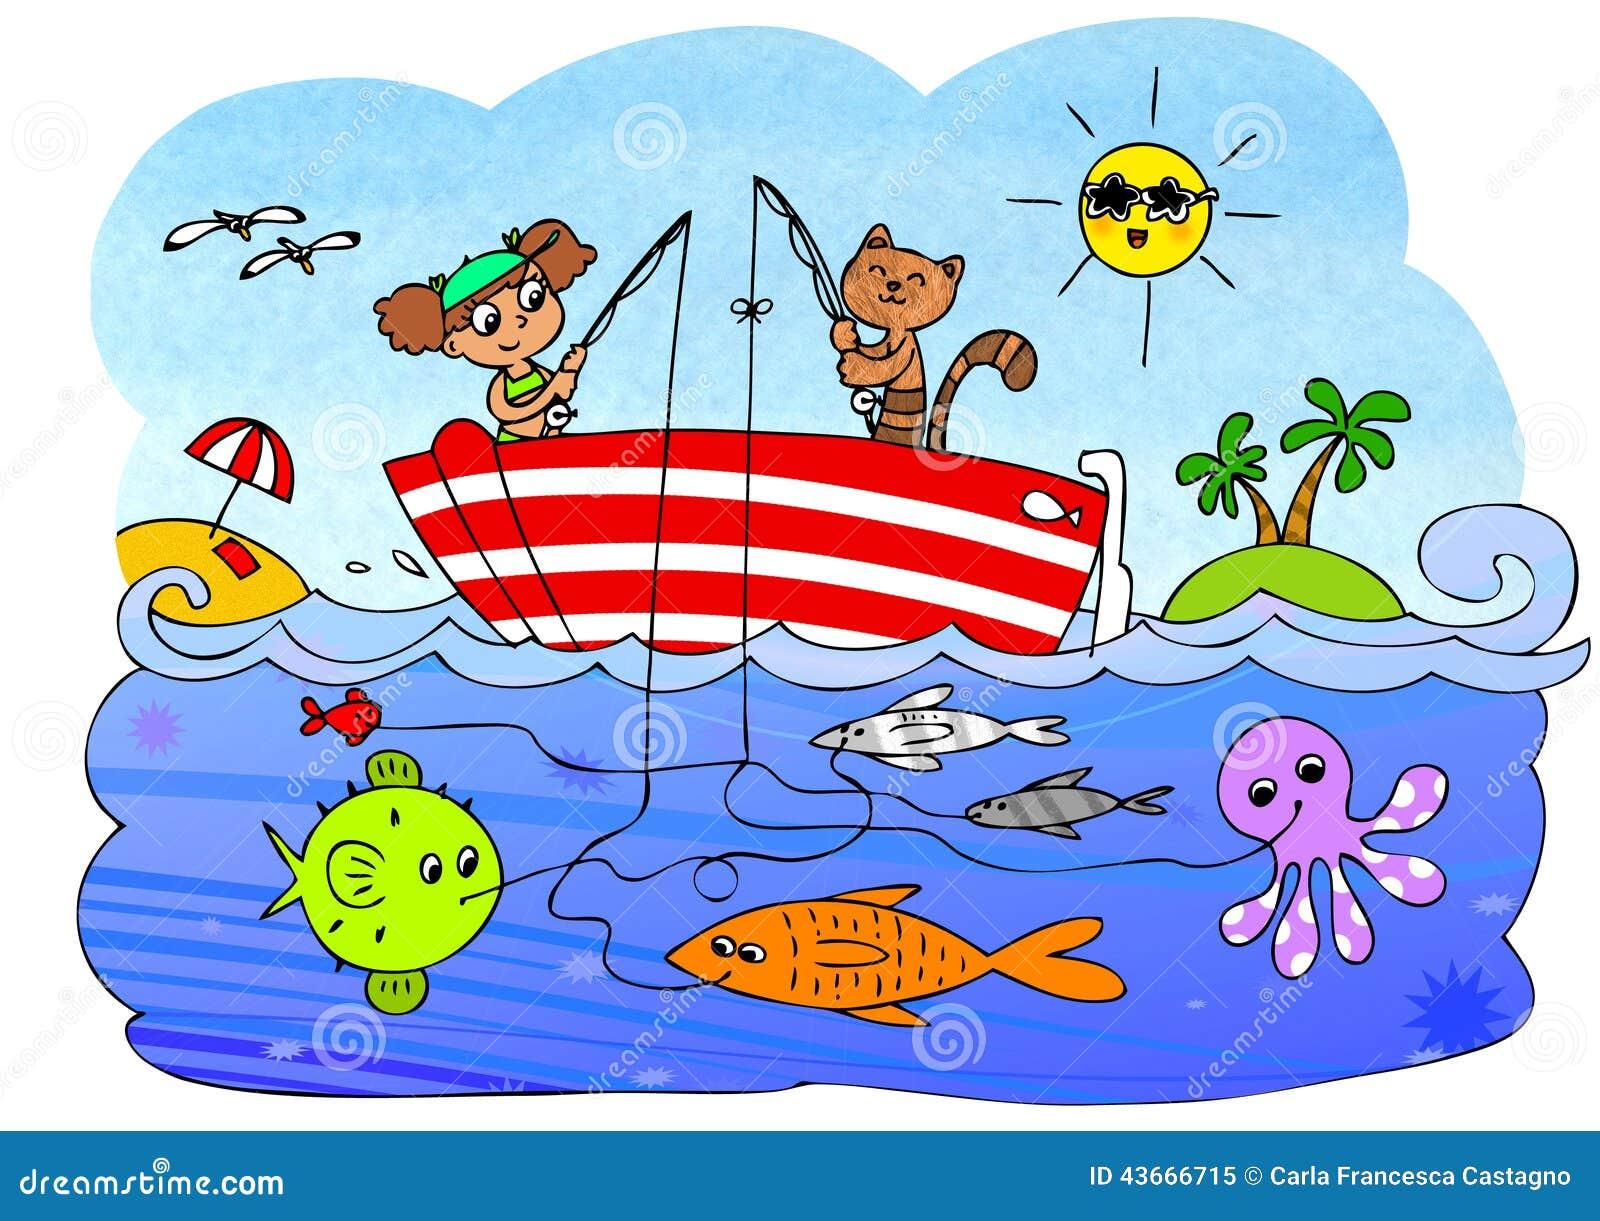 fish boat game for children stock illustration image